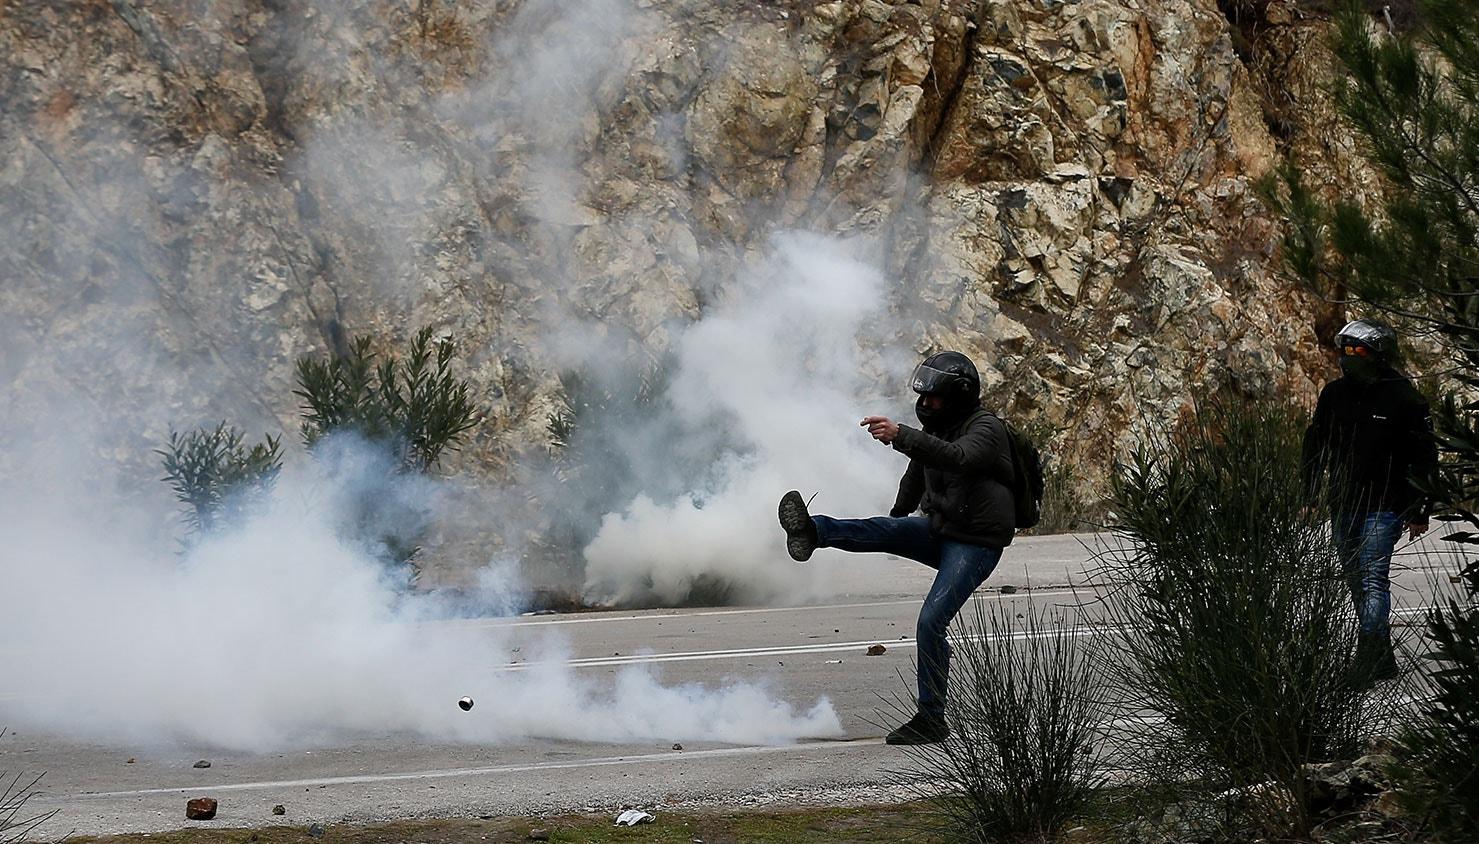 Costas Baltas - Reuters